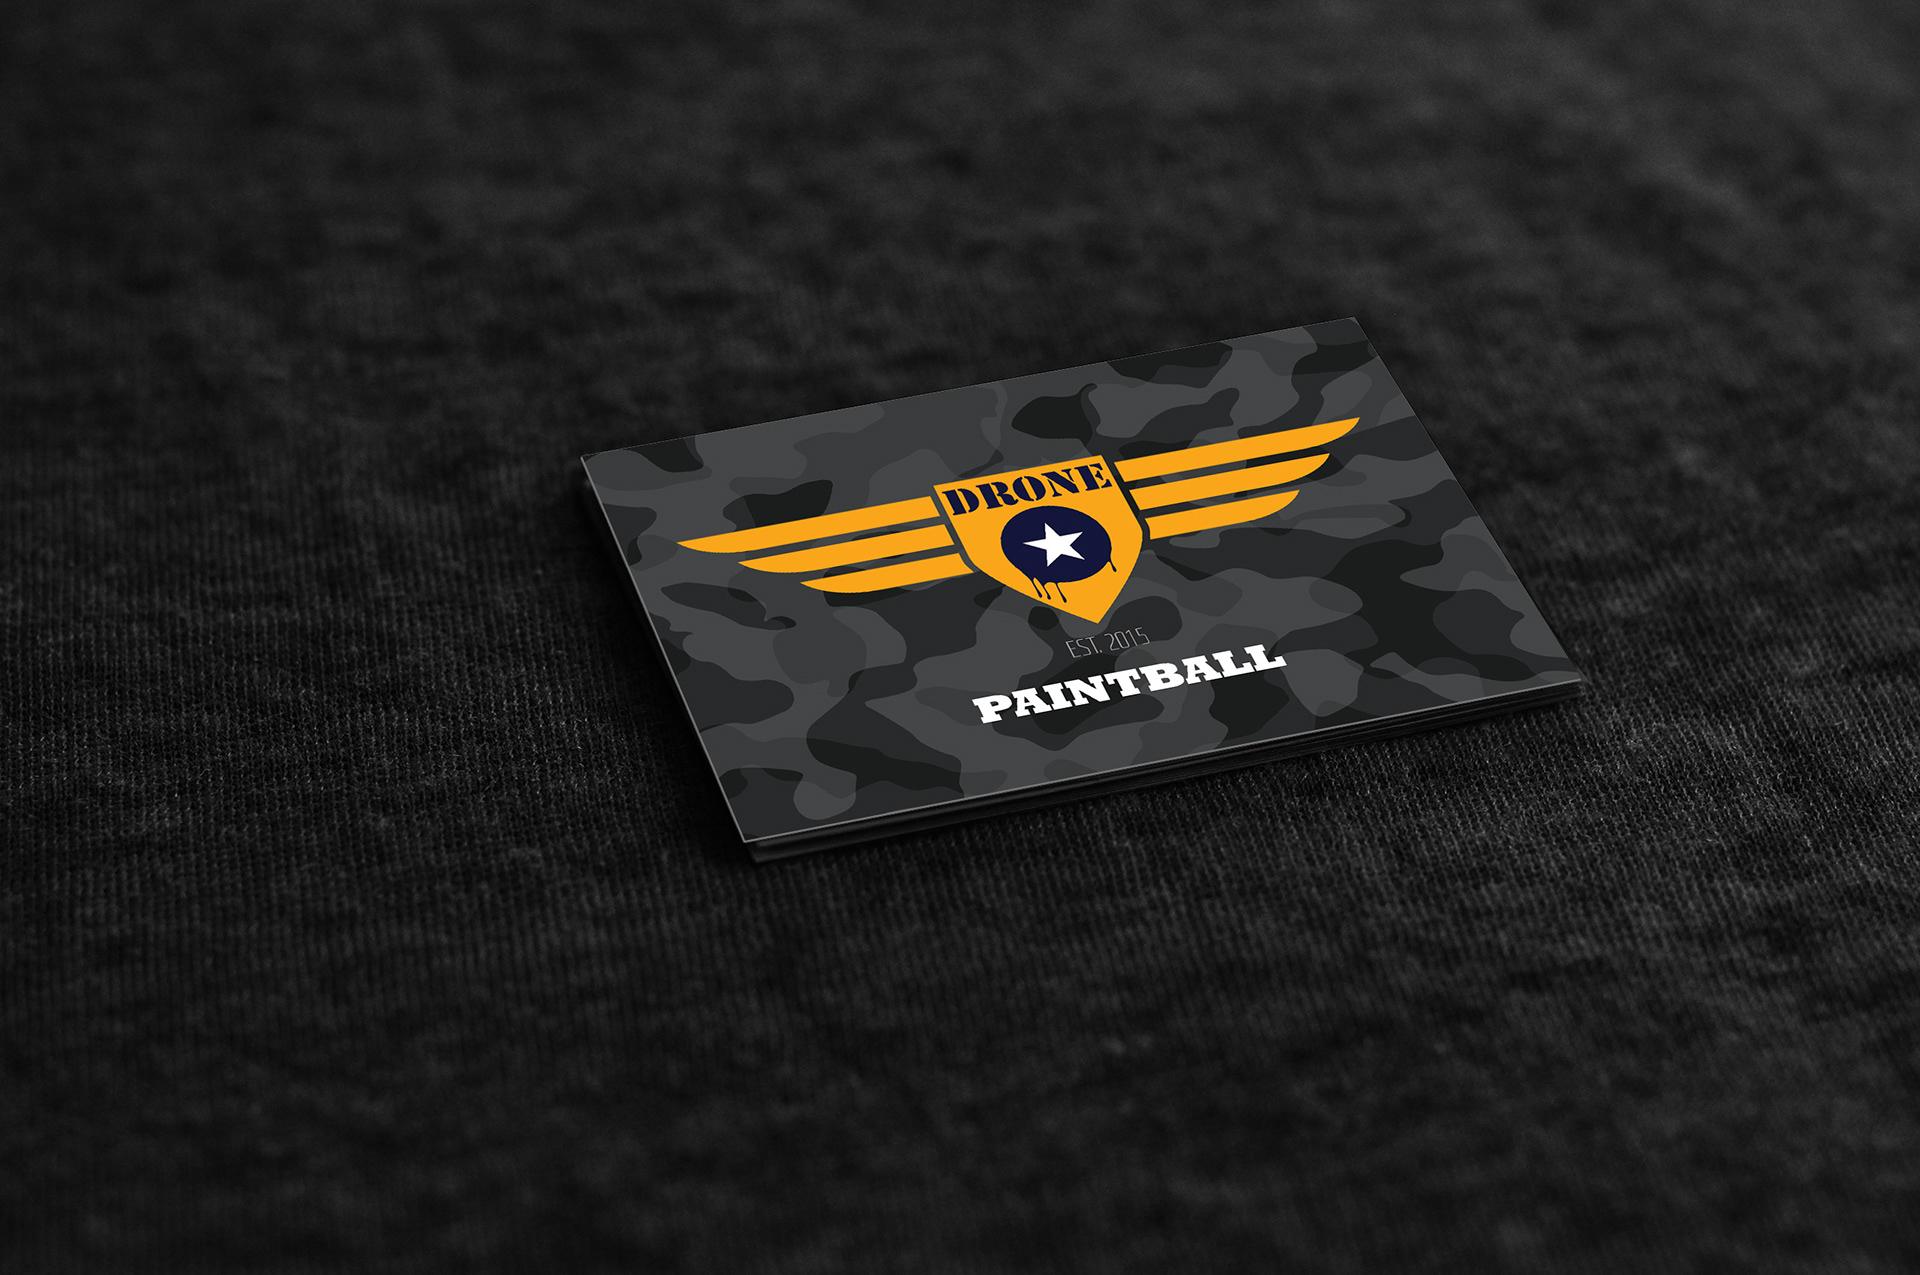 Thiago Crevatin | Portfolio - DRONE STAR PAINTBALL | Business Card